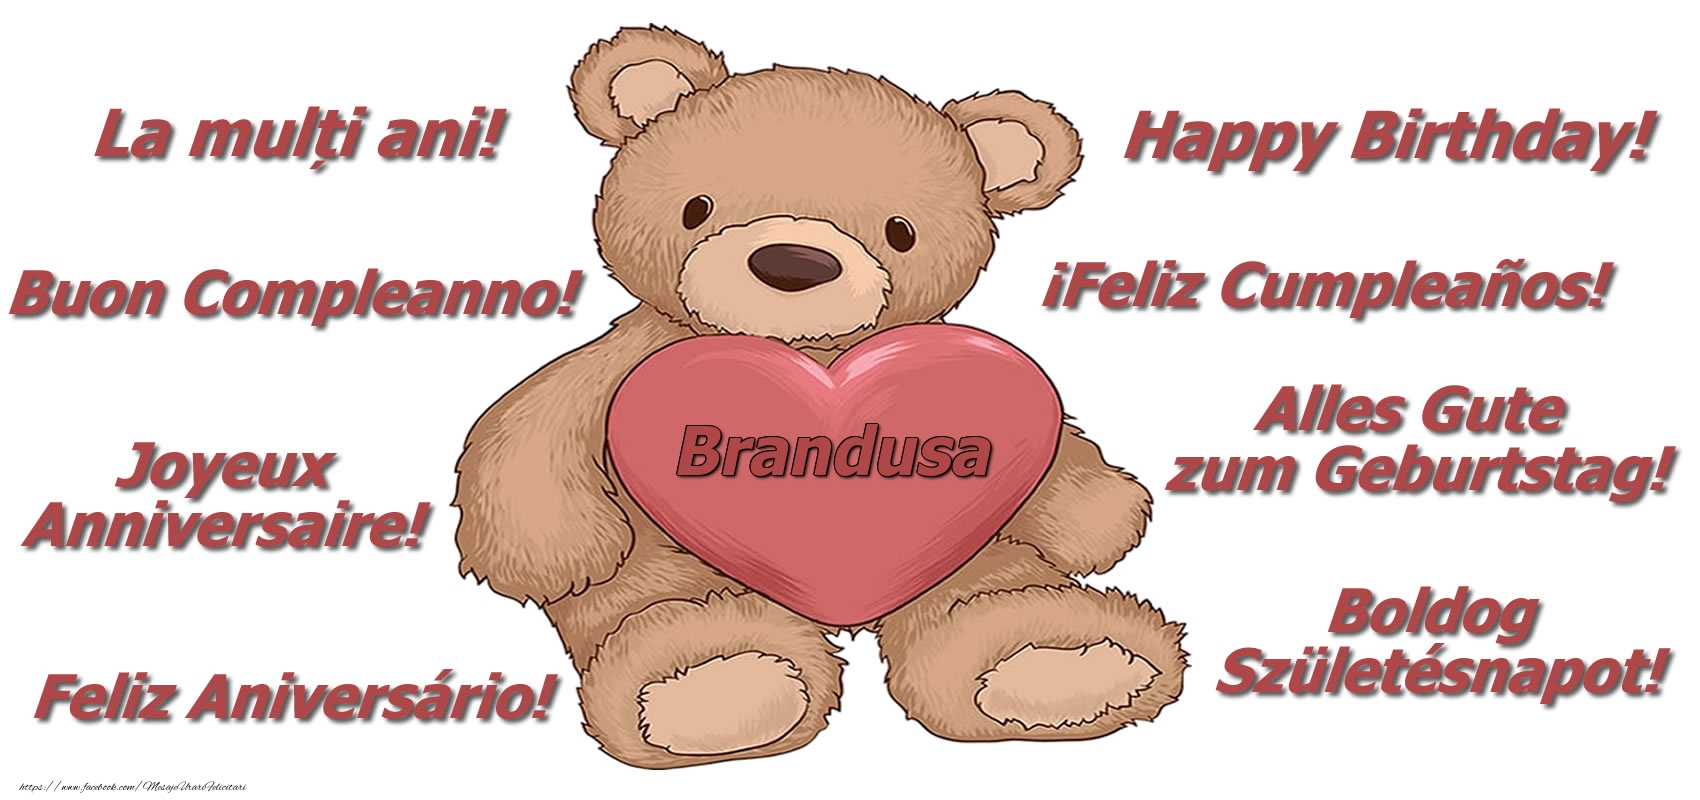 Felicitari de zi de nastere - La multi ani Brandusa! - Ursulet